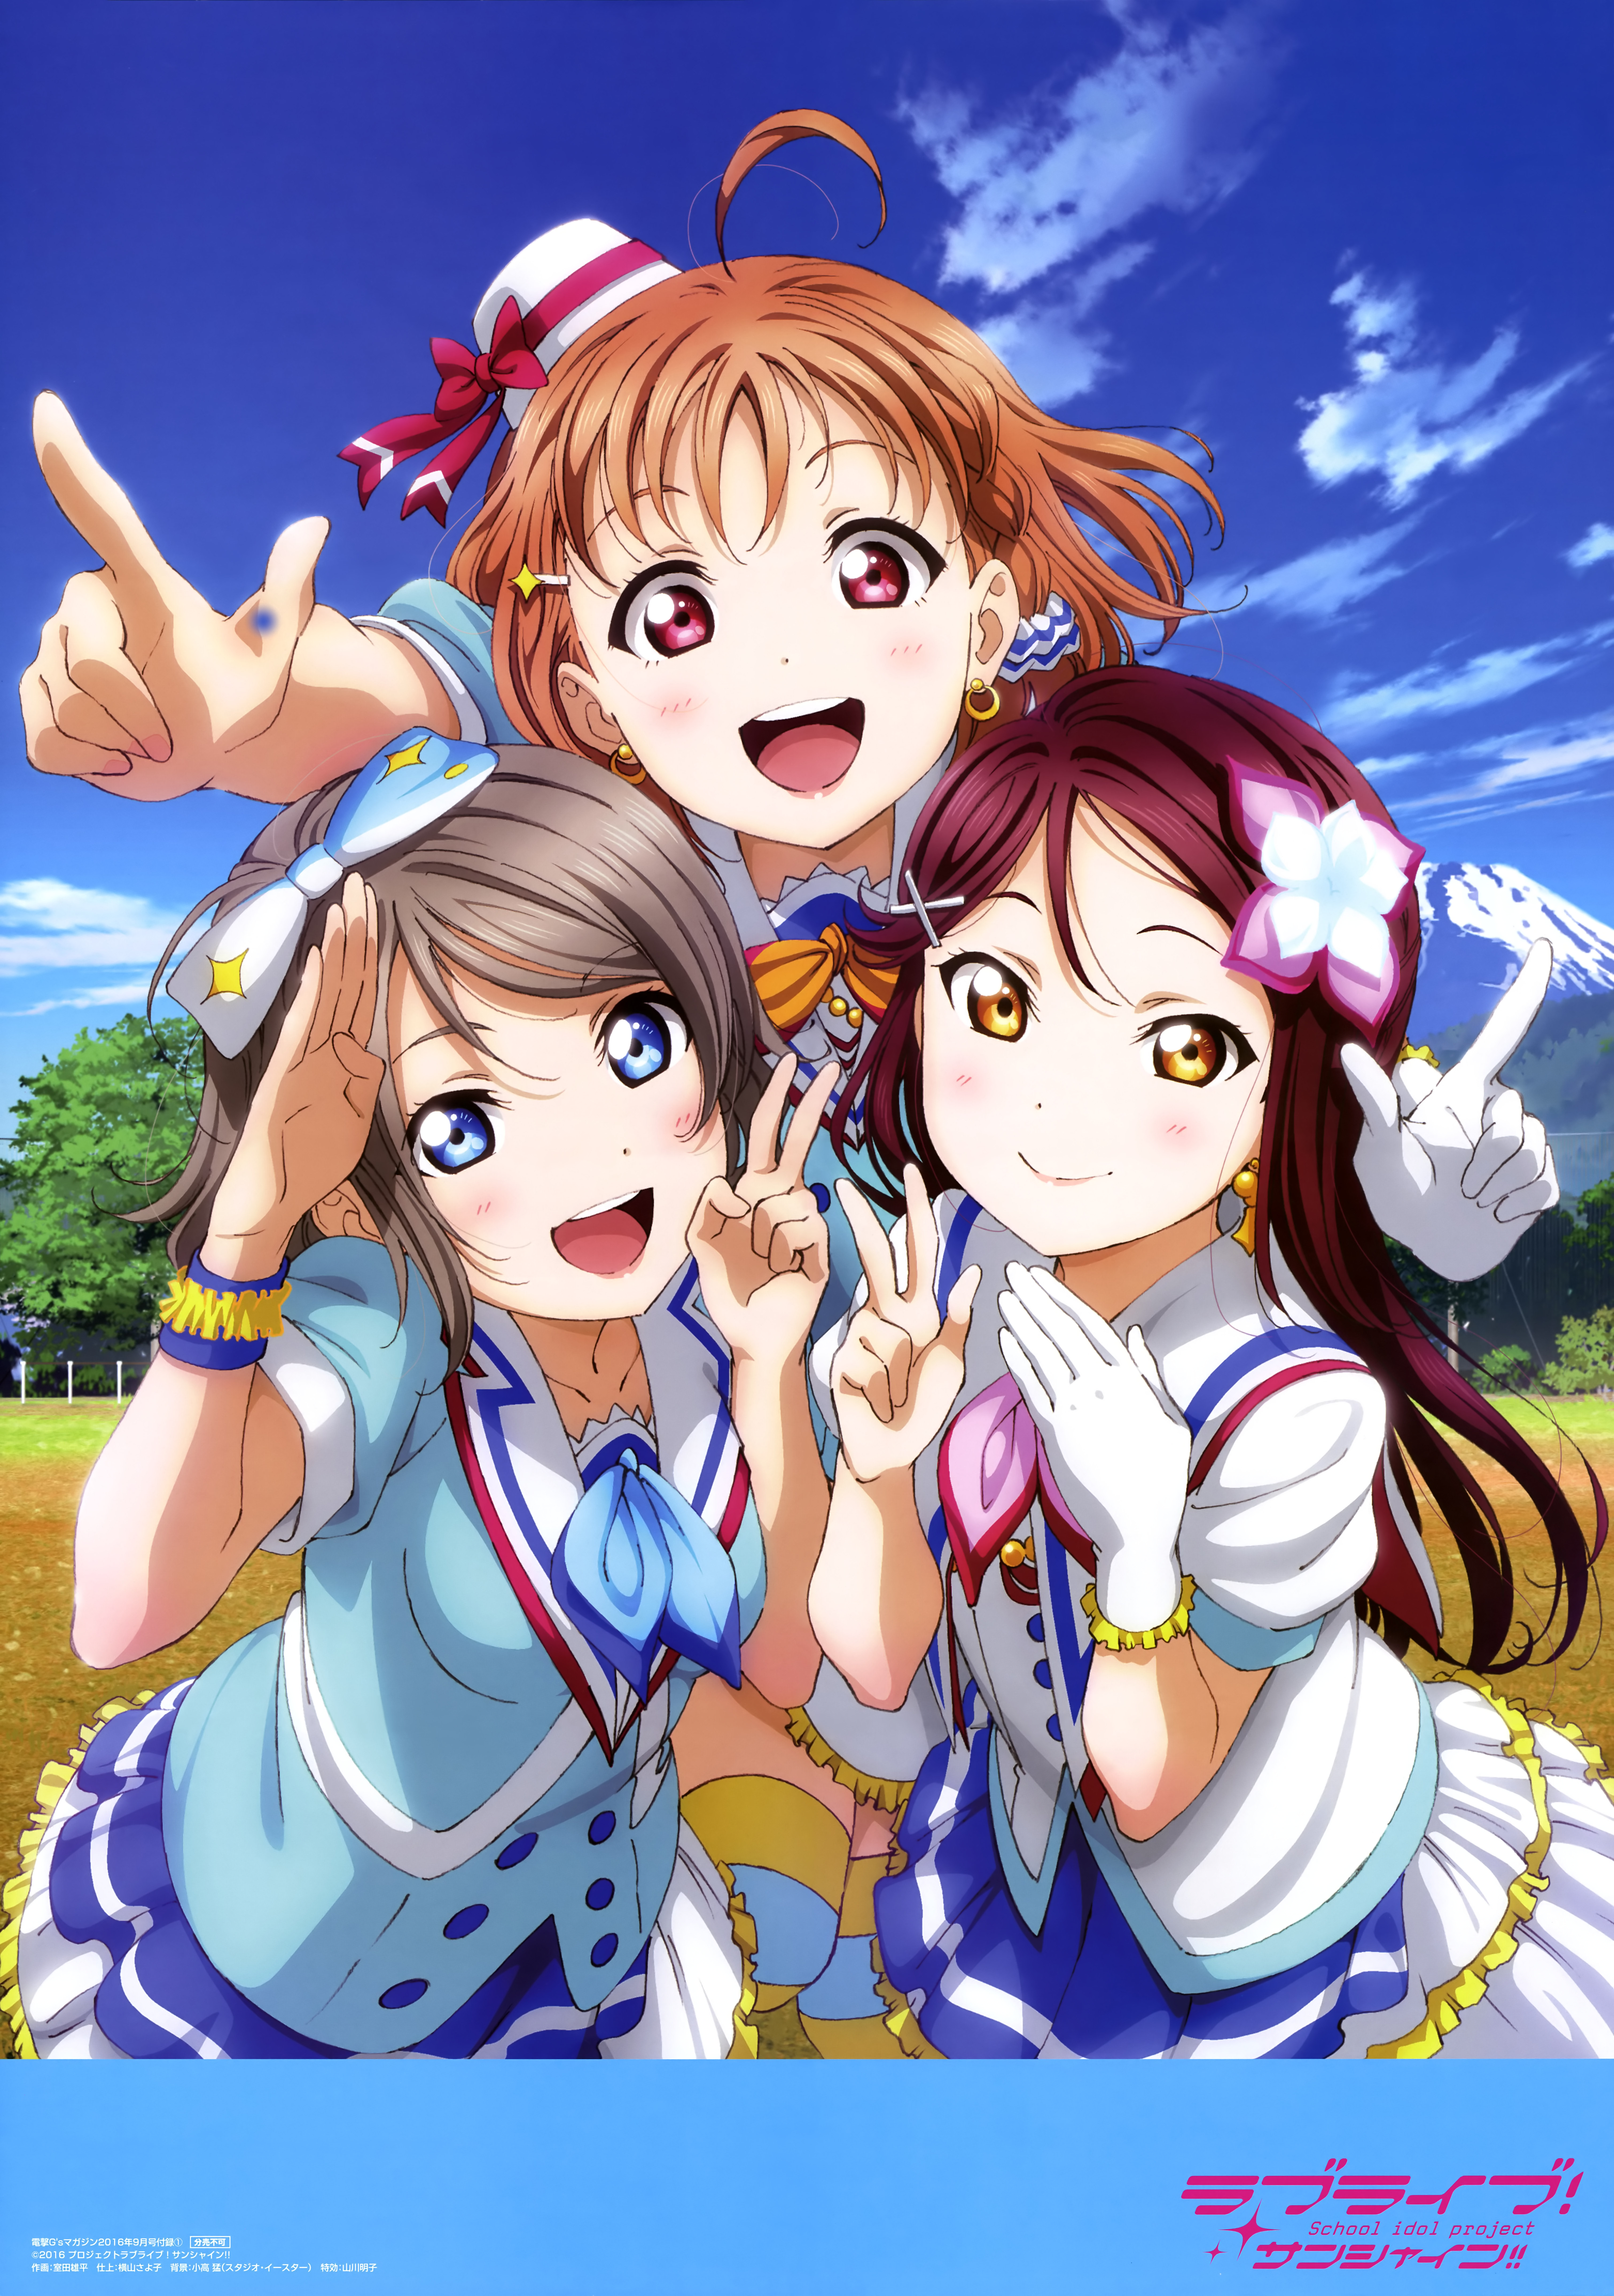 Love Live Wallpaper Zerochan : Love Live! Sunshine!! Mobile Wallpaper #2029103 - Zerochan ...